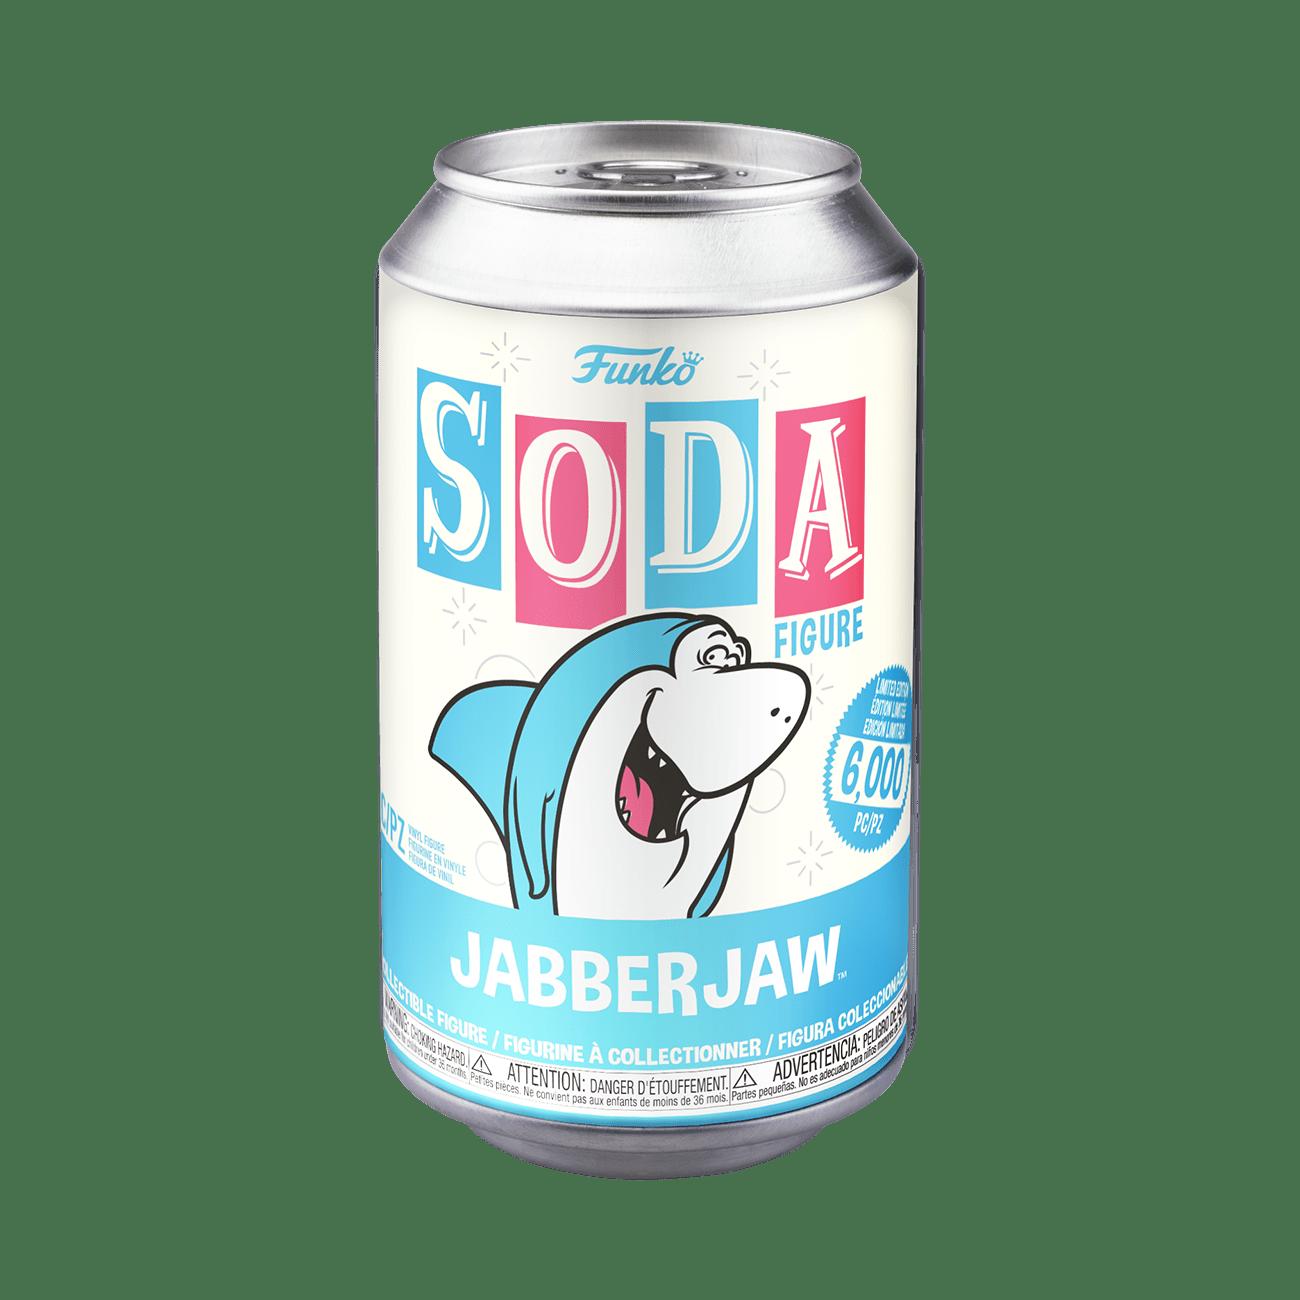 Funko SODA Jabber Jaw c/ Possibilidade de Chase (Edição Limitada a 6000 un)